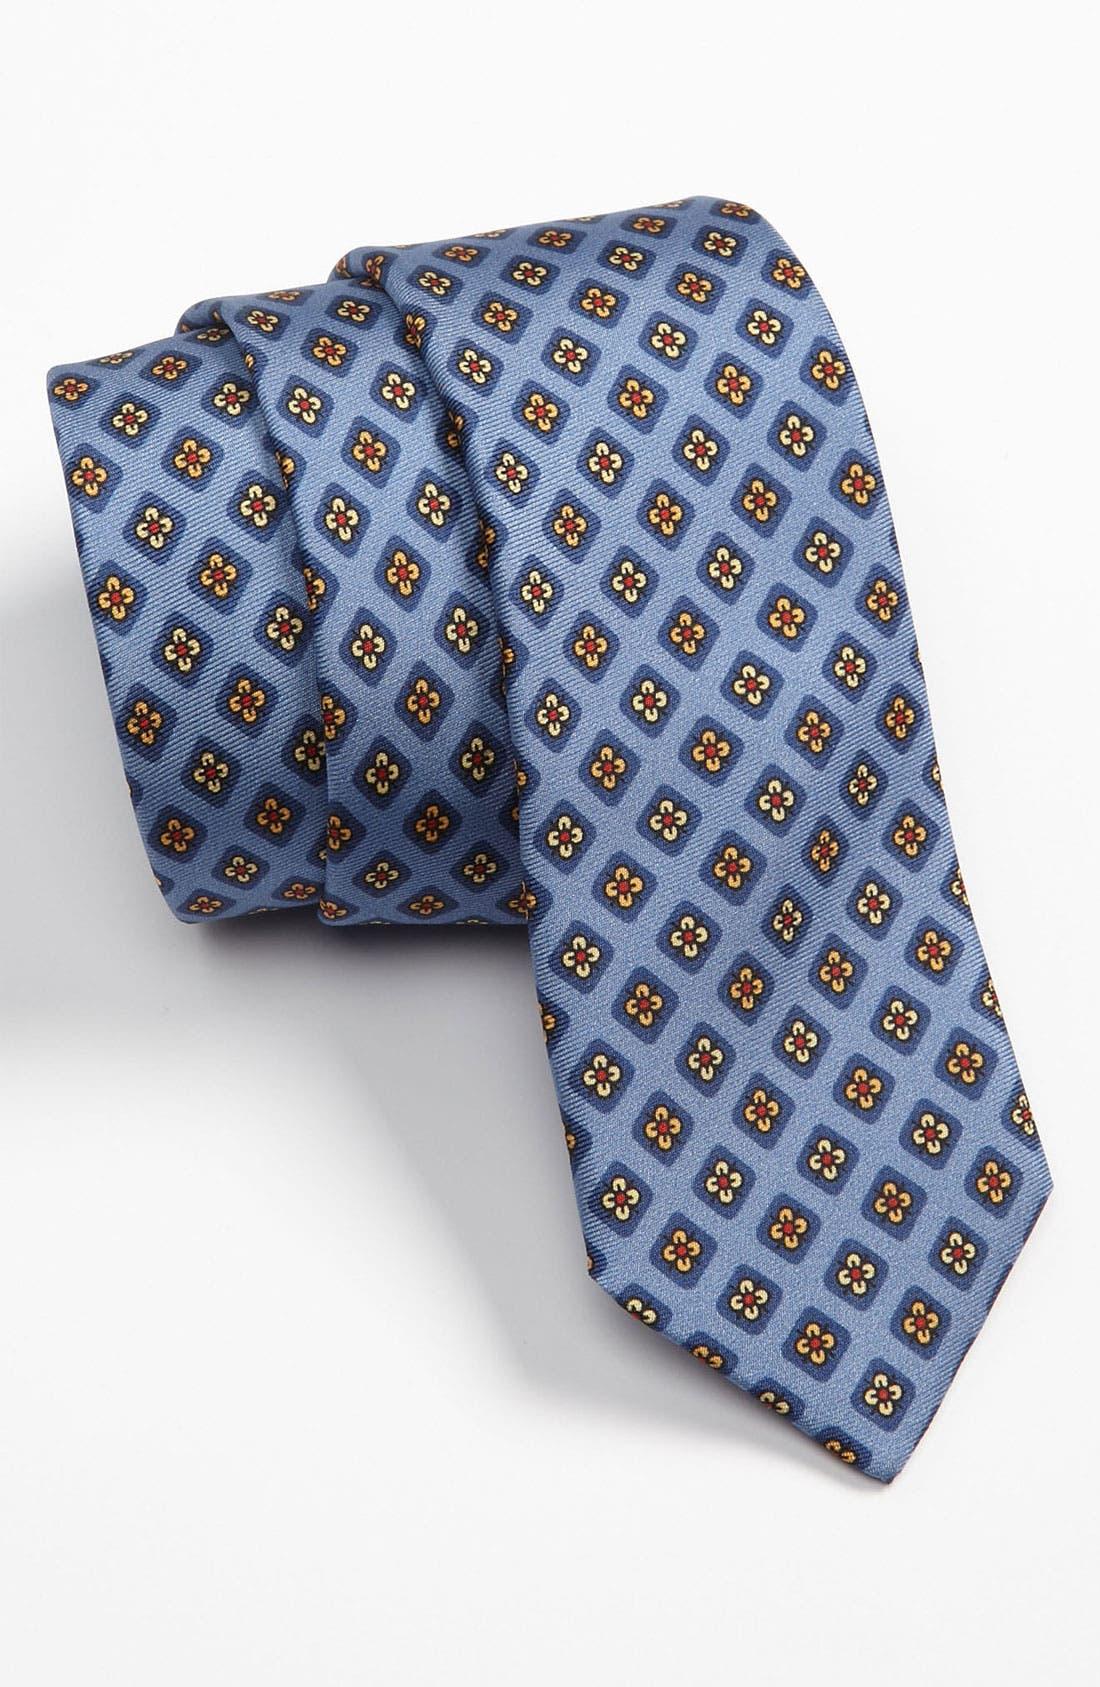 Main Image - David Hart Woven Silk Tie